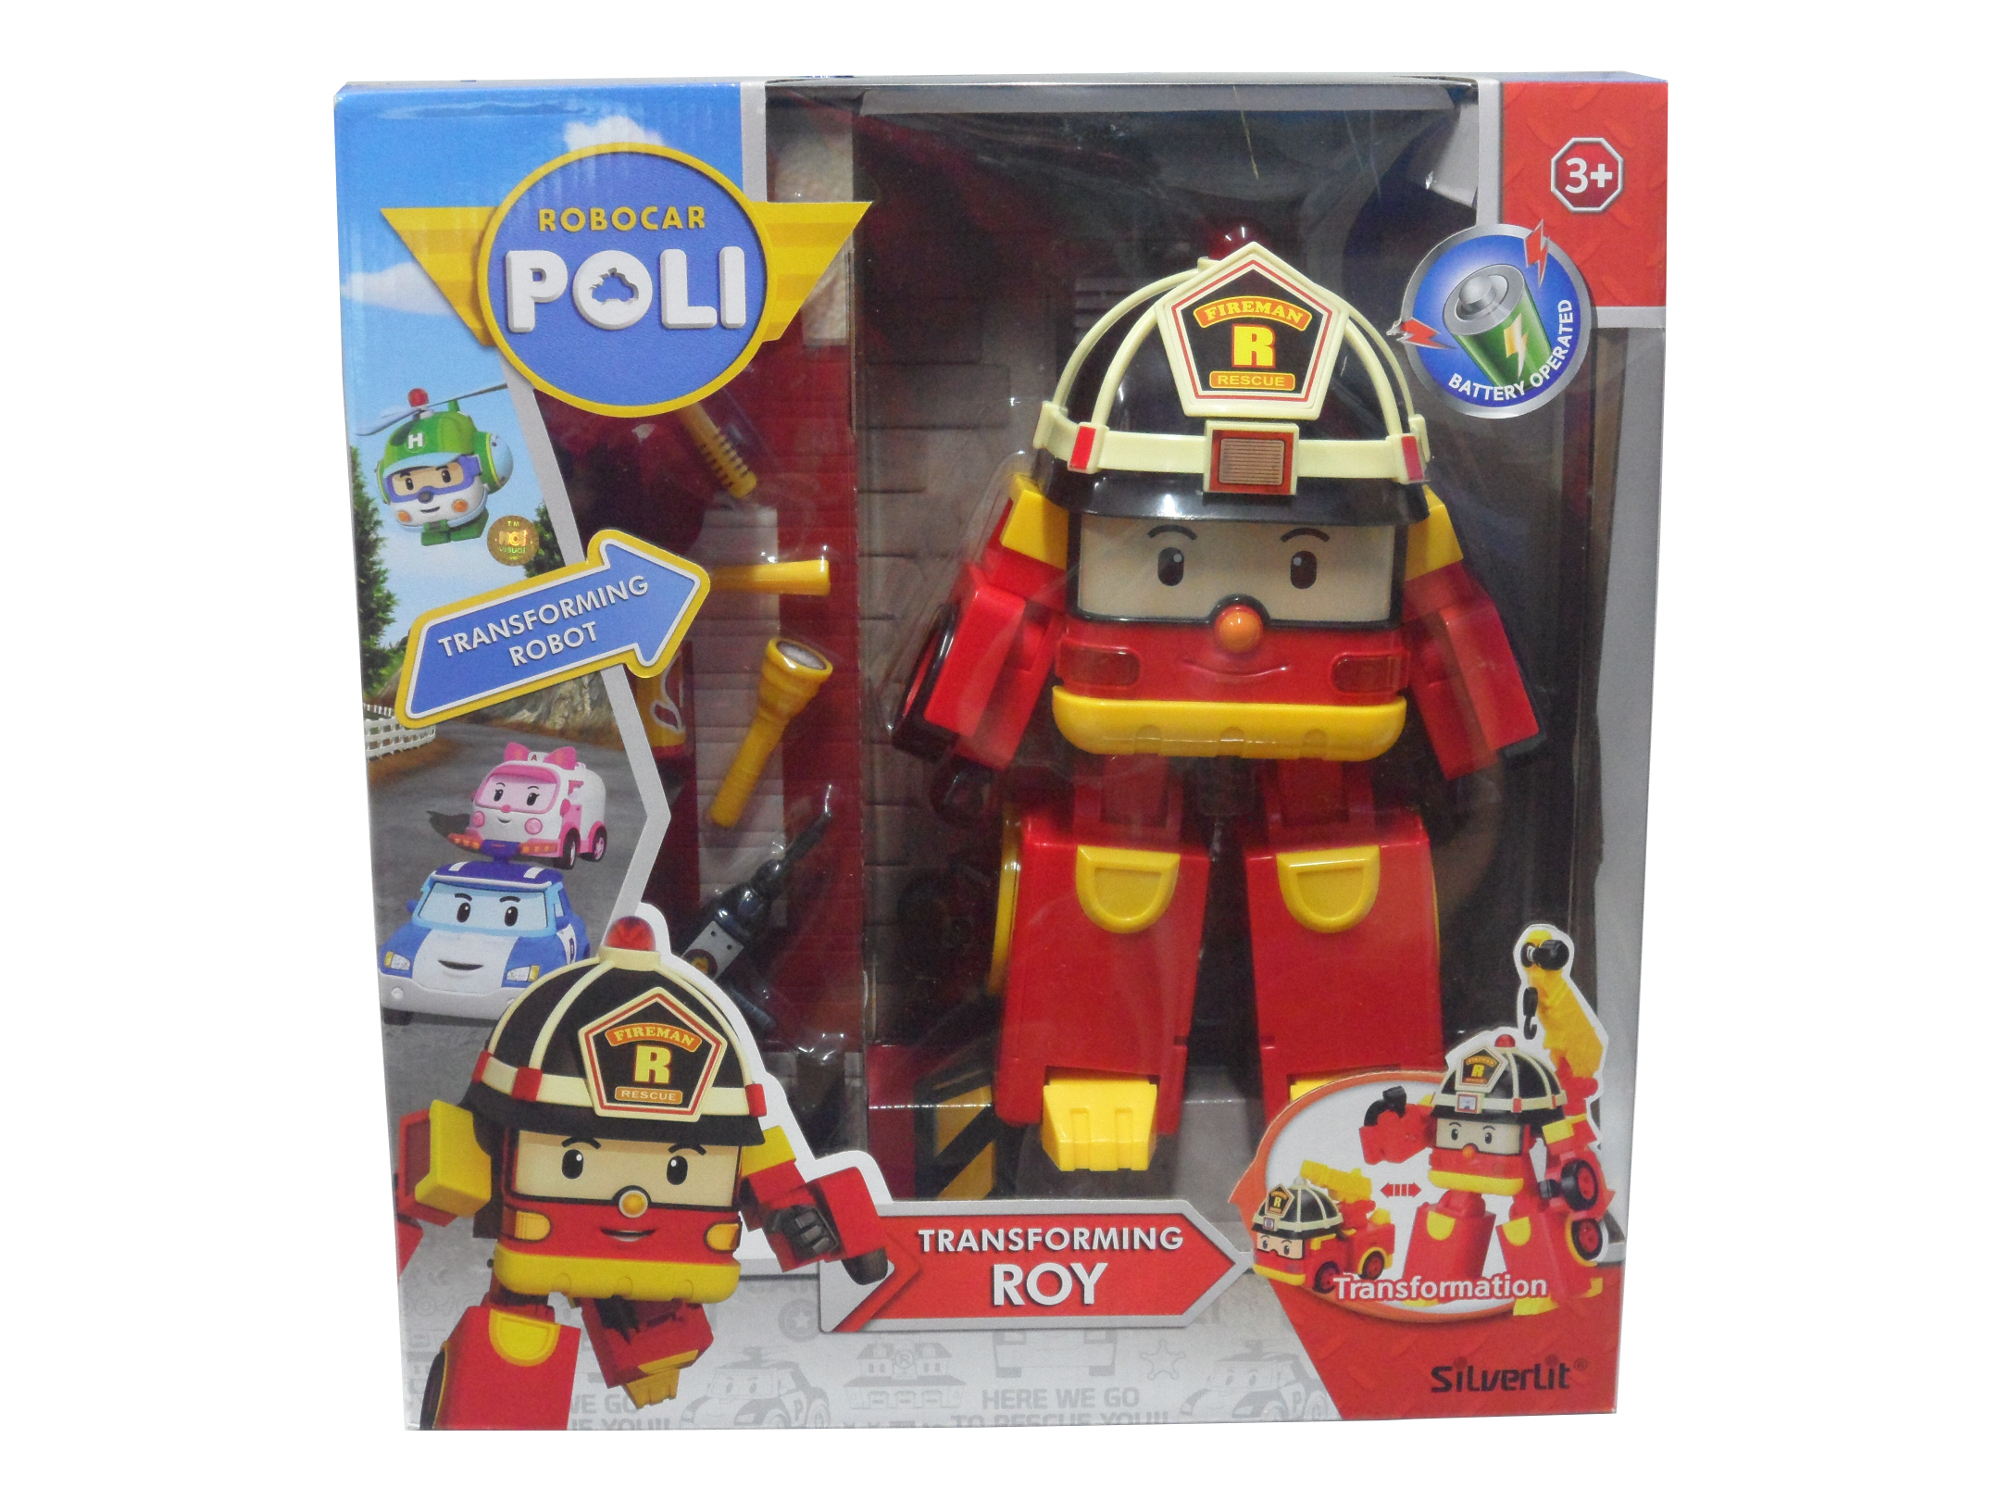 Robocar Poli Transforming Roy Review And Price serapportantà Chanson Robocar Poli